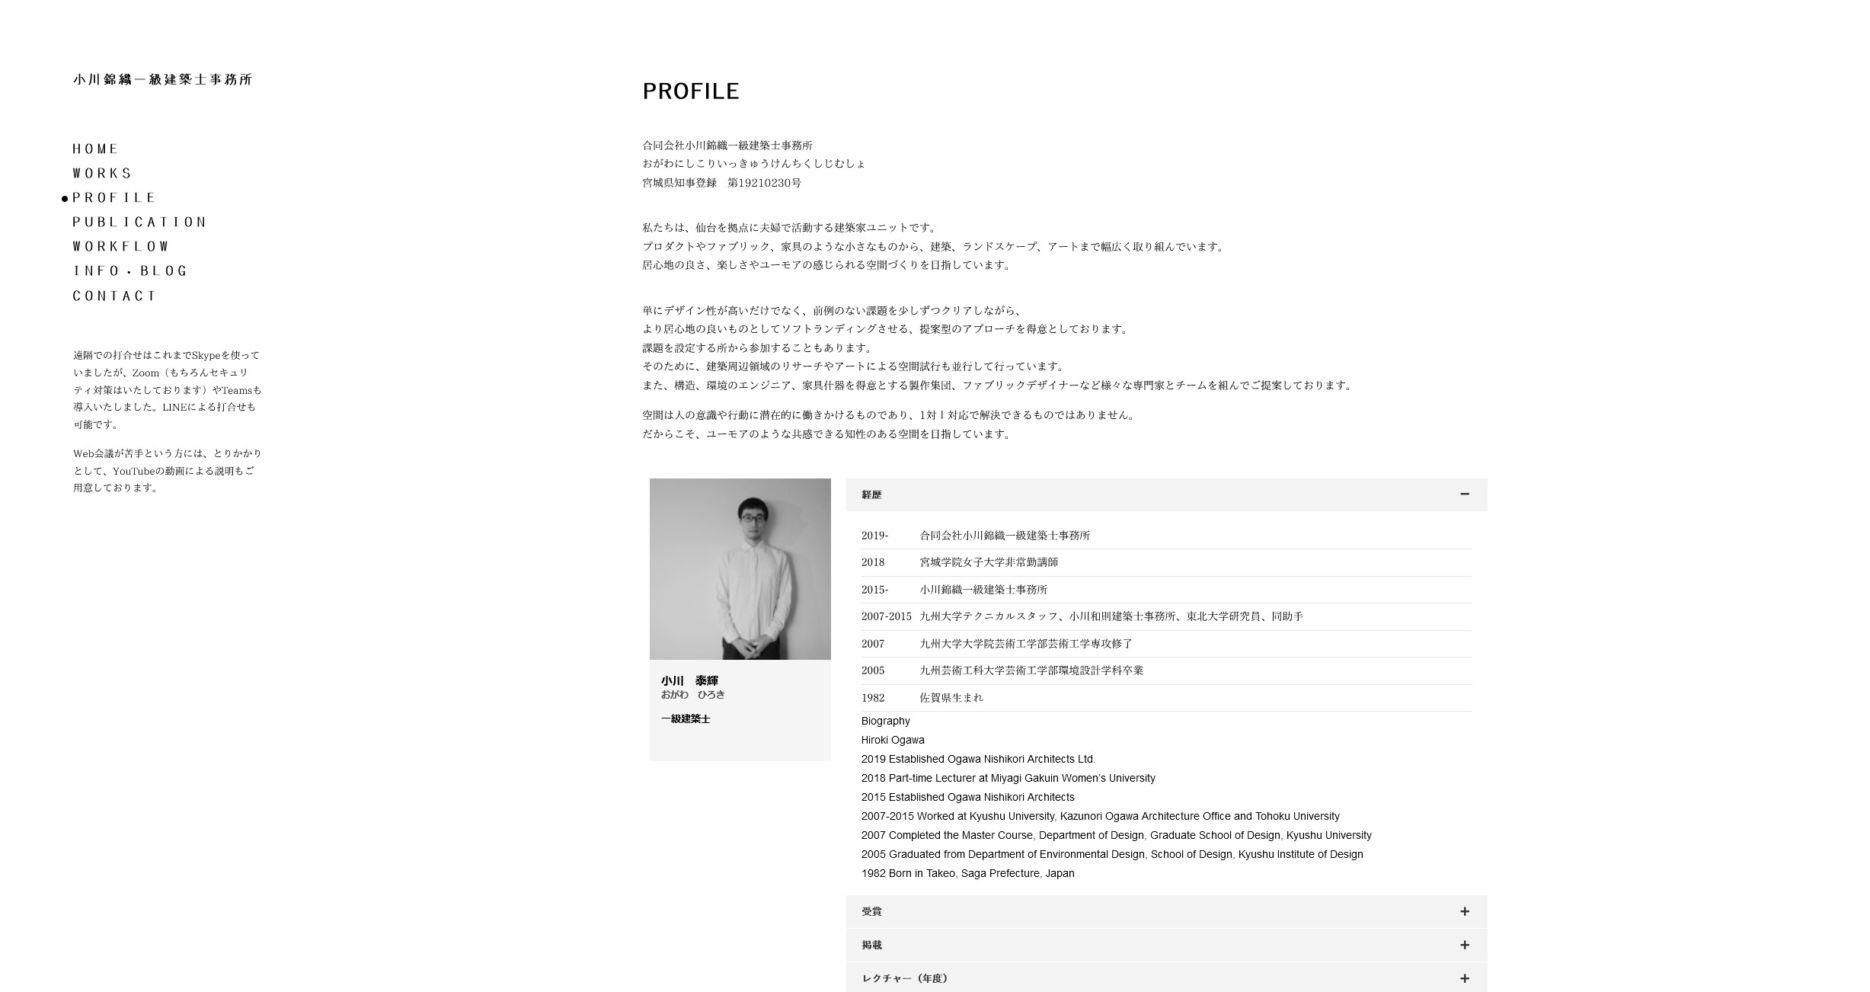 SnapCrab_NoName_2020-9-15_16-56-32_No-00